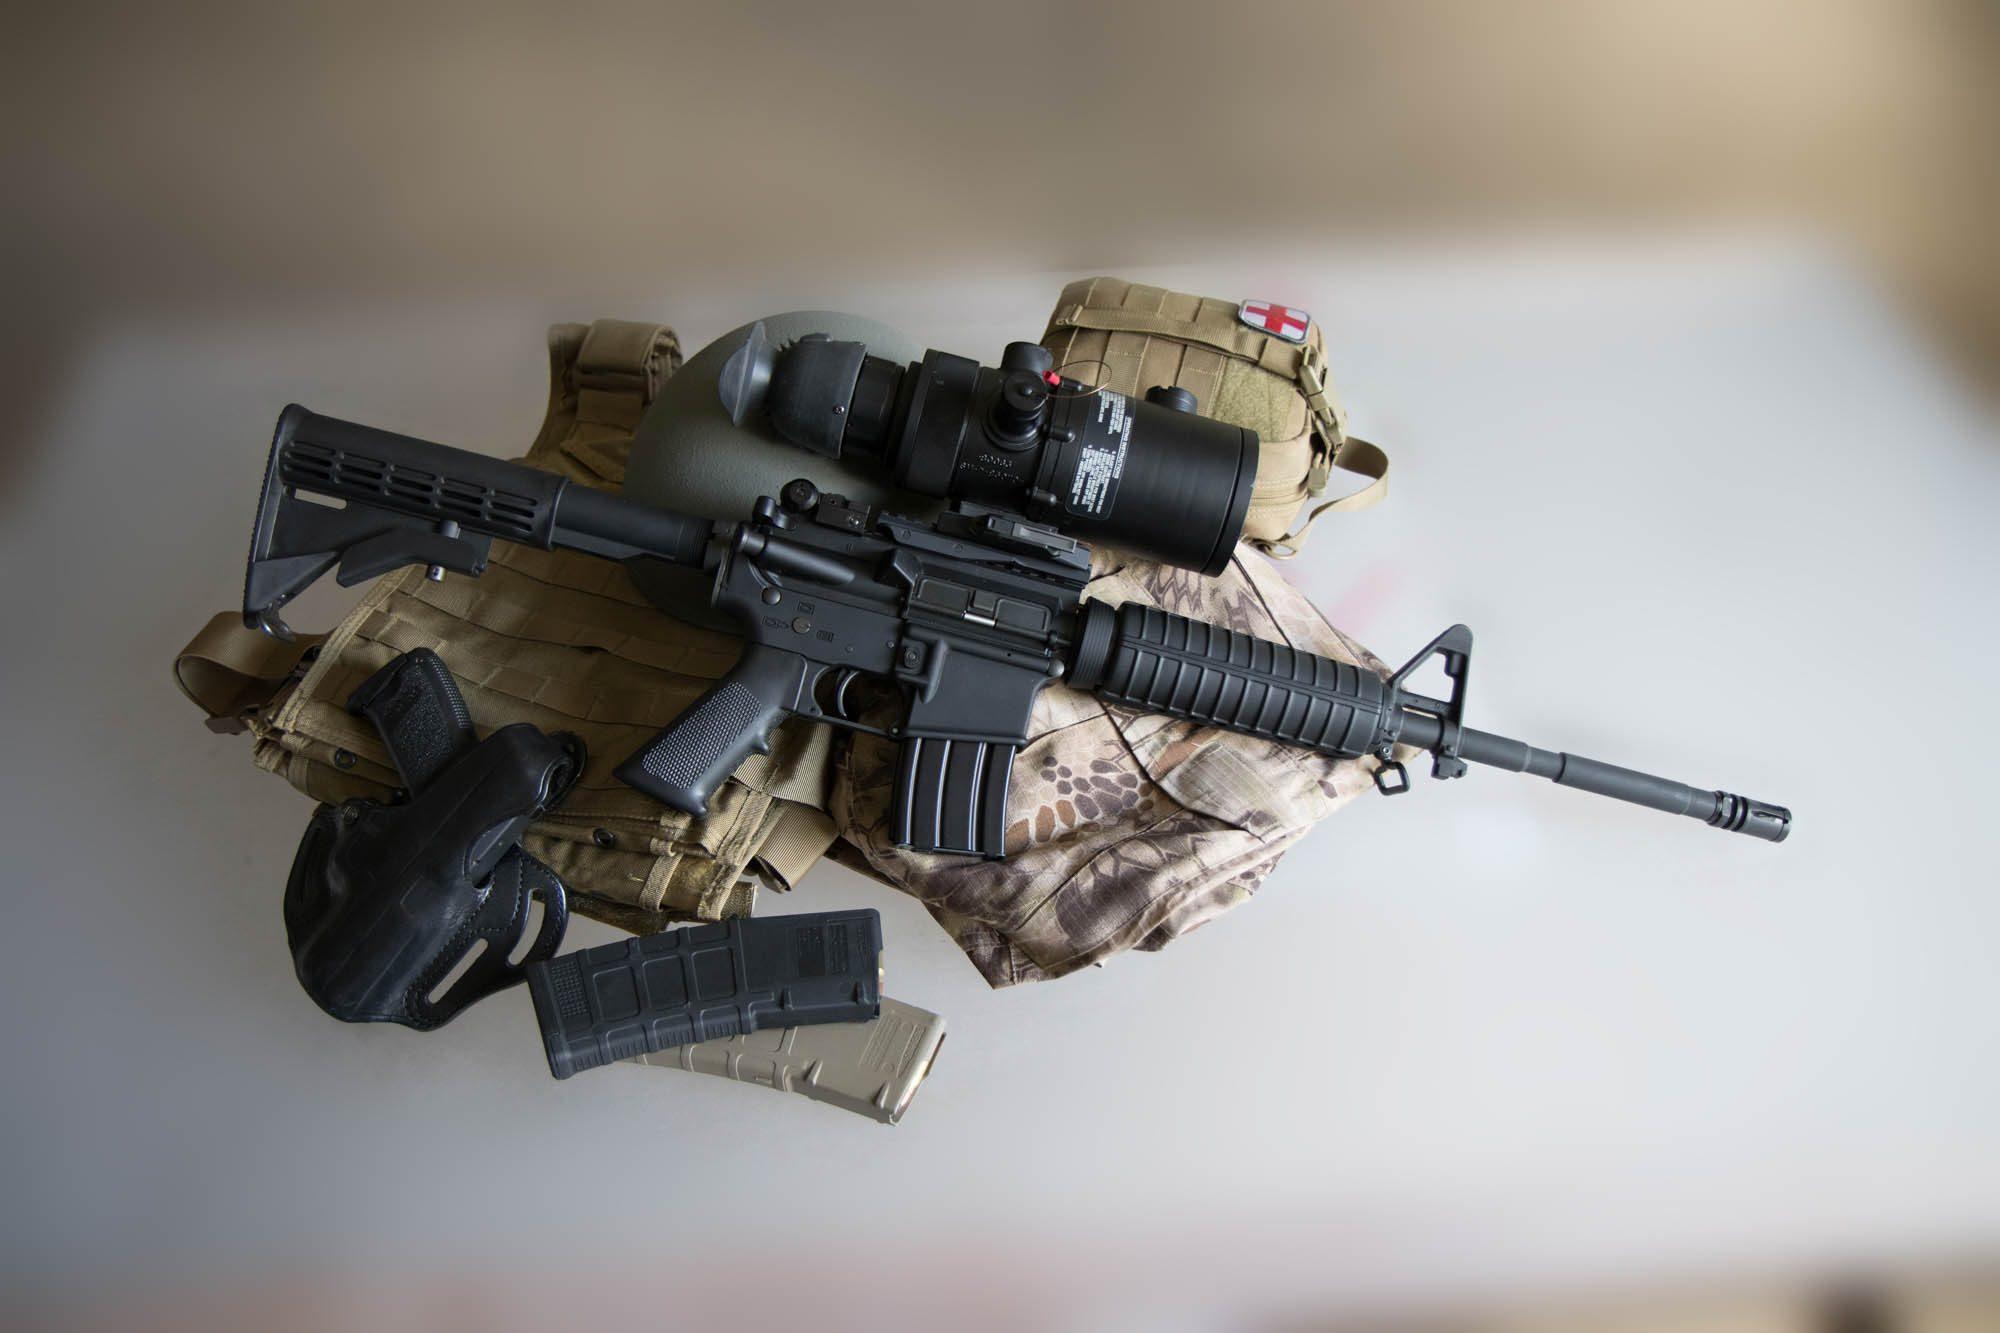 AN/PVS-4 Night Vision Sight on AR-15 - HK USP Compact - Magpul PMAGs